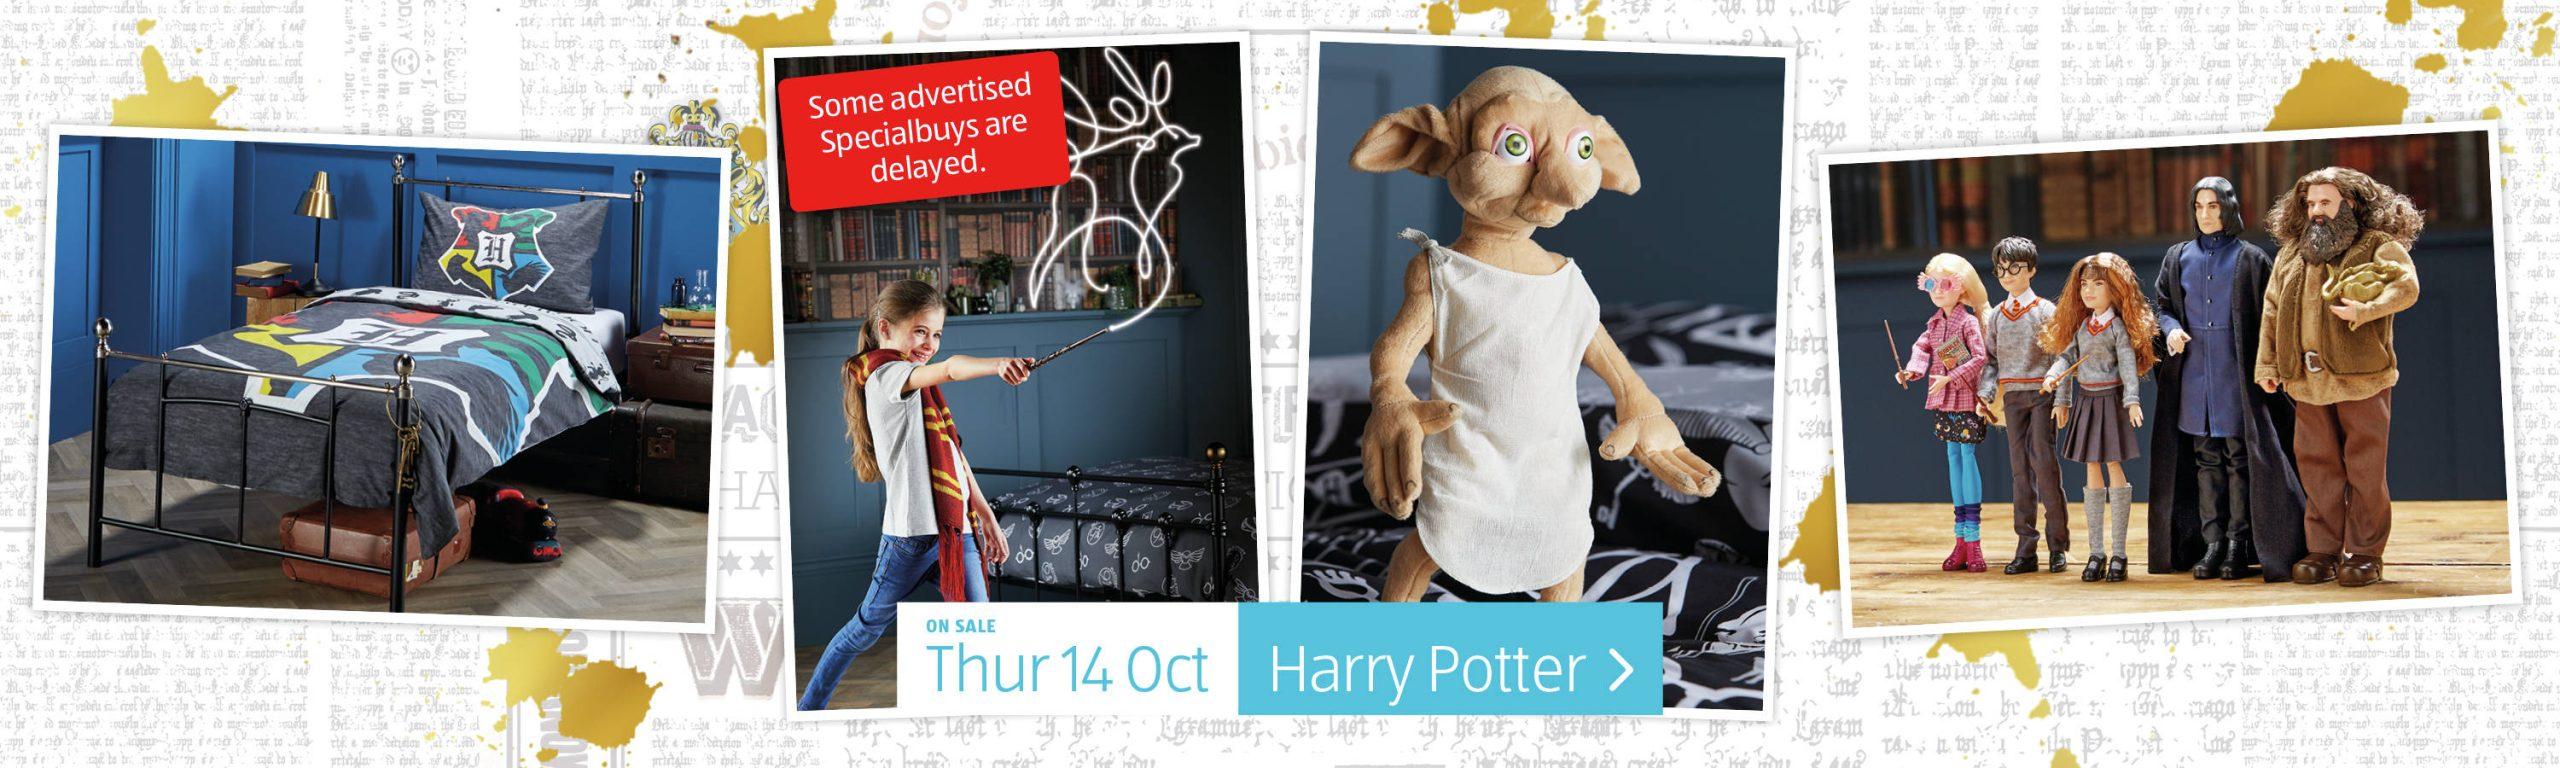 ALDI Thursday Offers 14th October 2021 ALDI Harry Potter